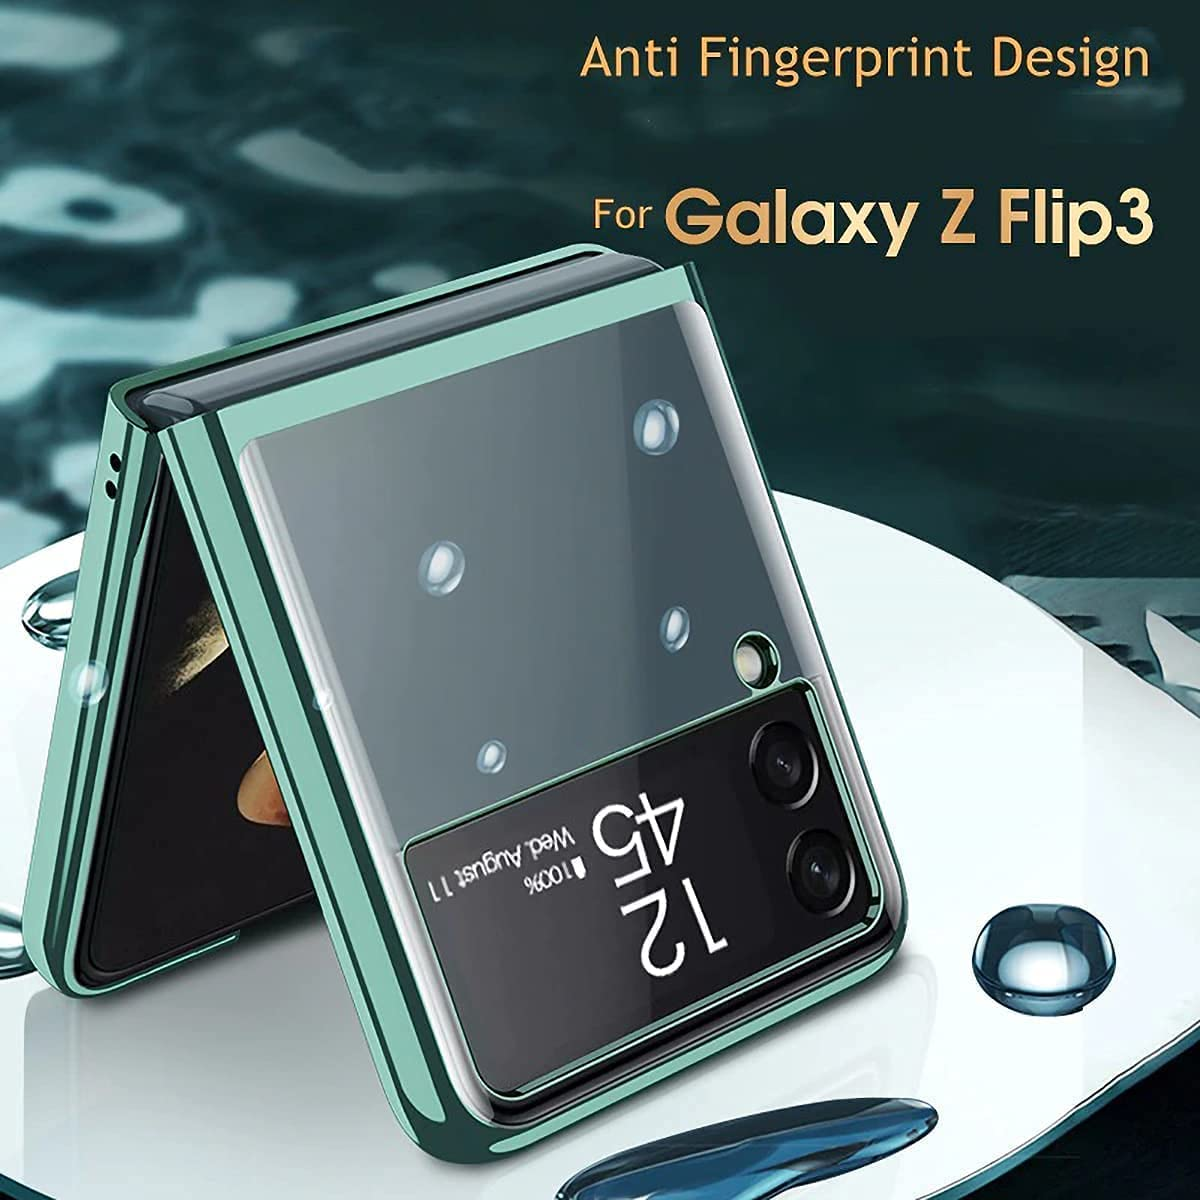 Apply to Z Flip 3 Case, Galaxy Z Flip 3 Case, Samsung Z Flip 3 Case, Clear Crystal Transparent Plating Case, Slim Case Designed, Ultra-Thin Fiber Leather Shockproof Protective Case (Clear-Green)